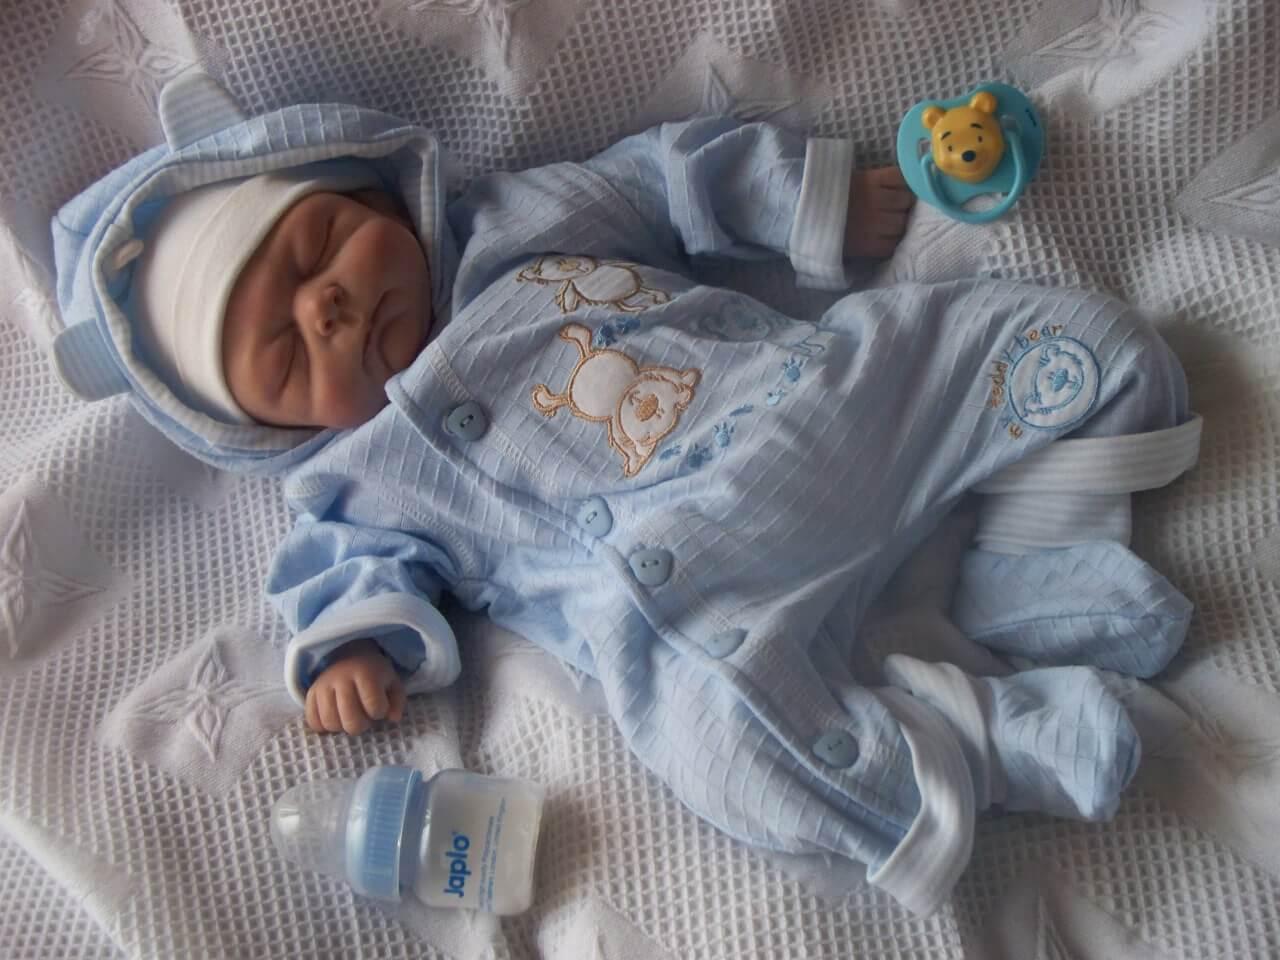 Neugeborenes - baby-junge-in-pyjama